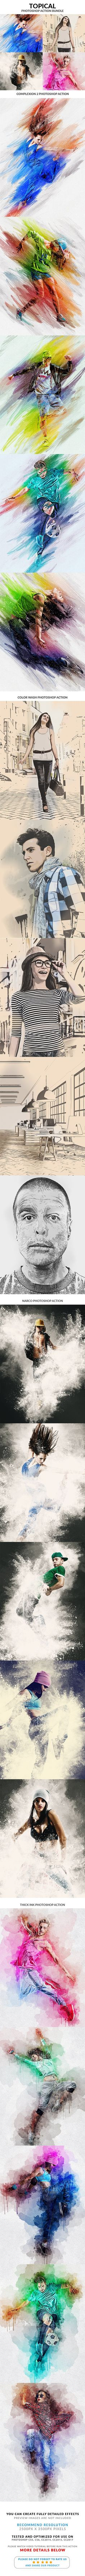 More Details About Actions Complexion 2 Photoshop Action Color Wash Photoshop Action Narco Photoshop Action Thick Ink Photoshop Ac